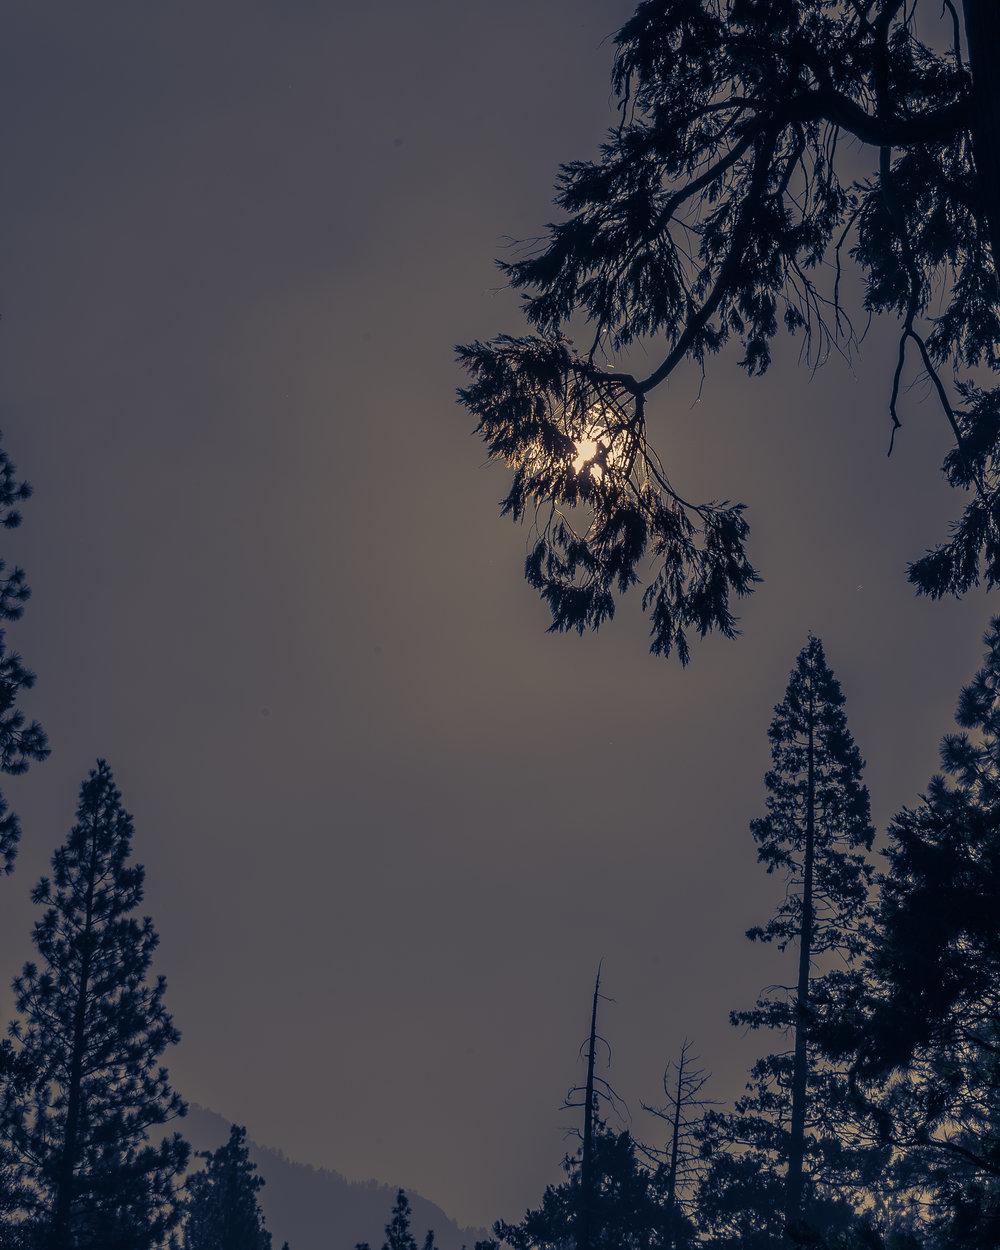 NAPA-Yosemite-59.jpg